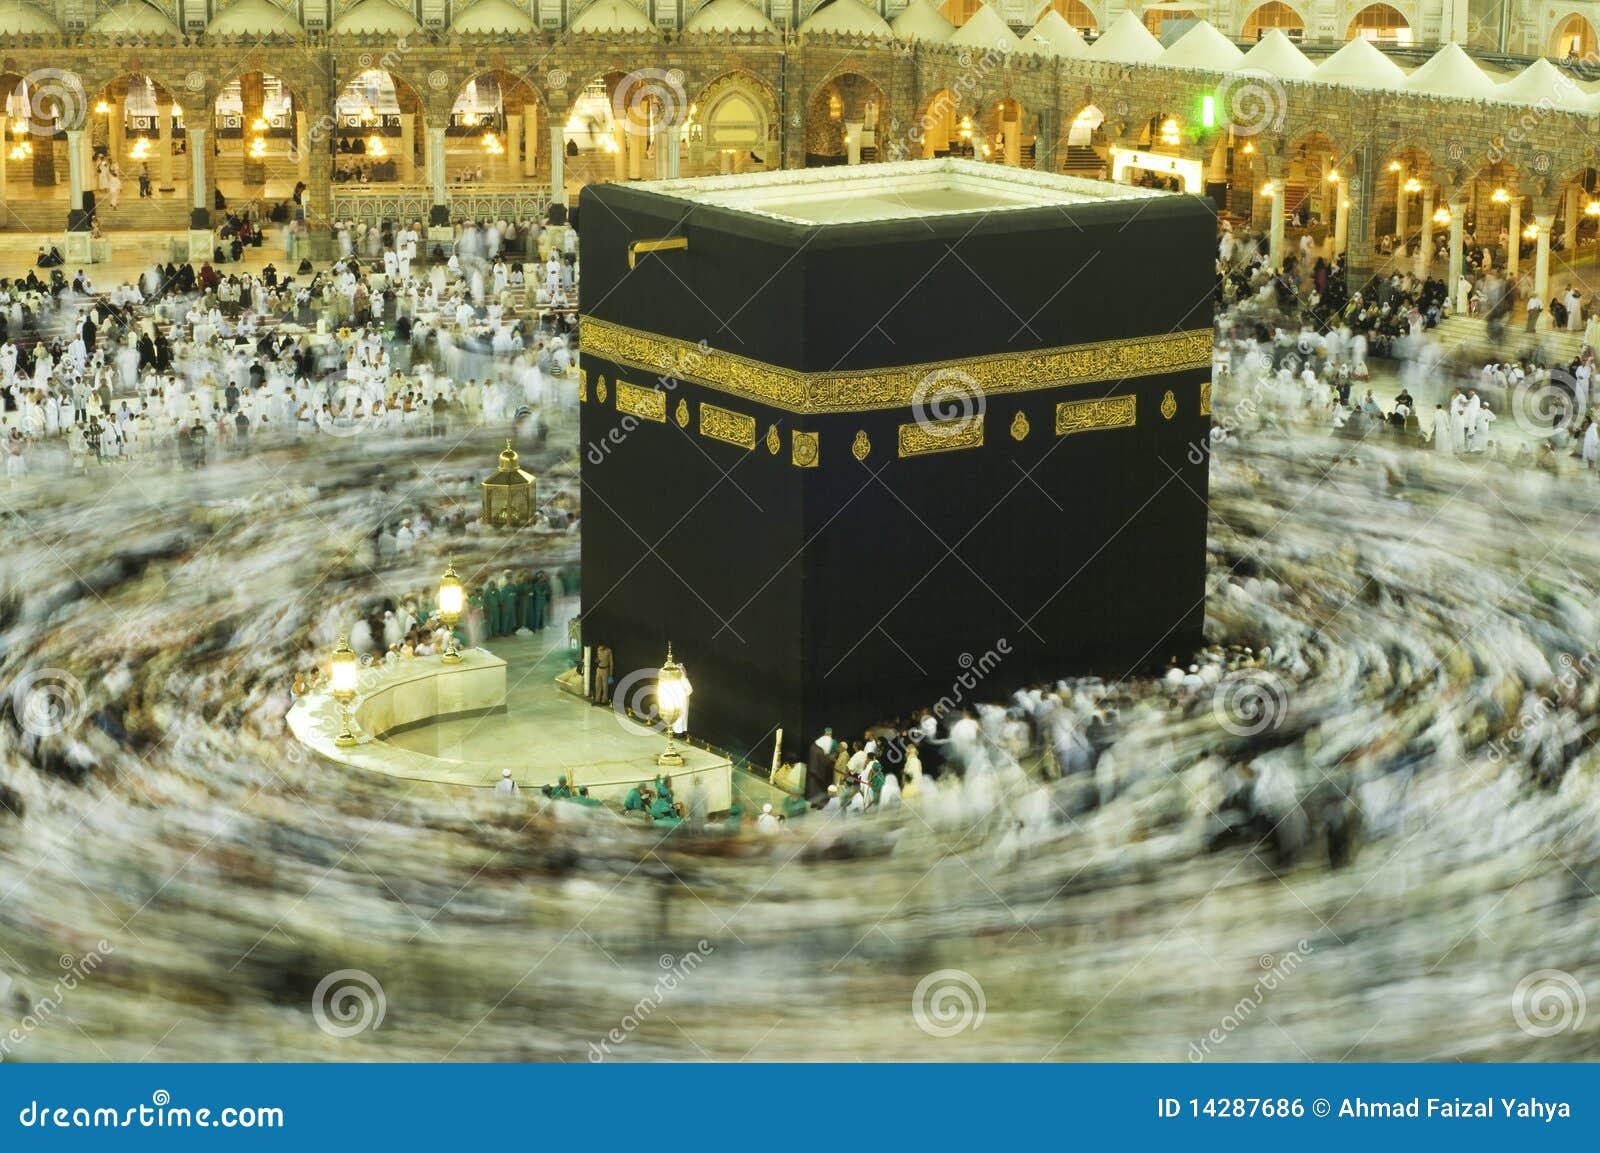 Kaaba in Makkah, Kingdom of Saudi Arabia.